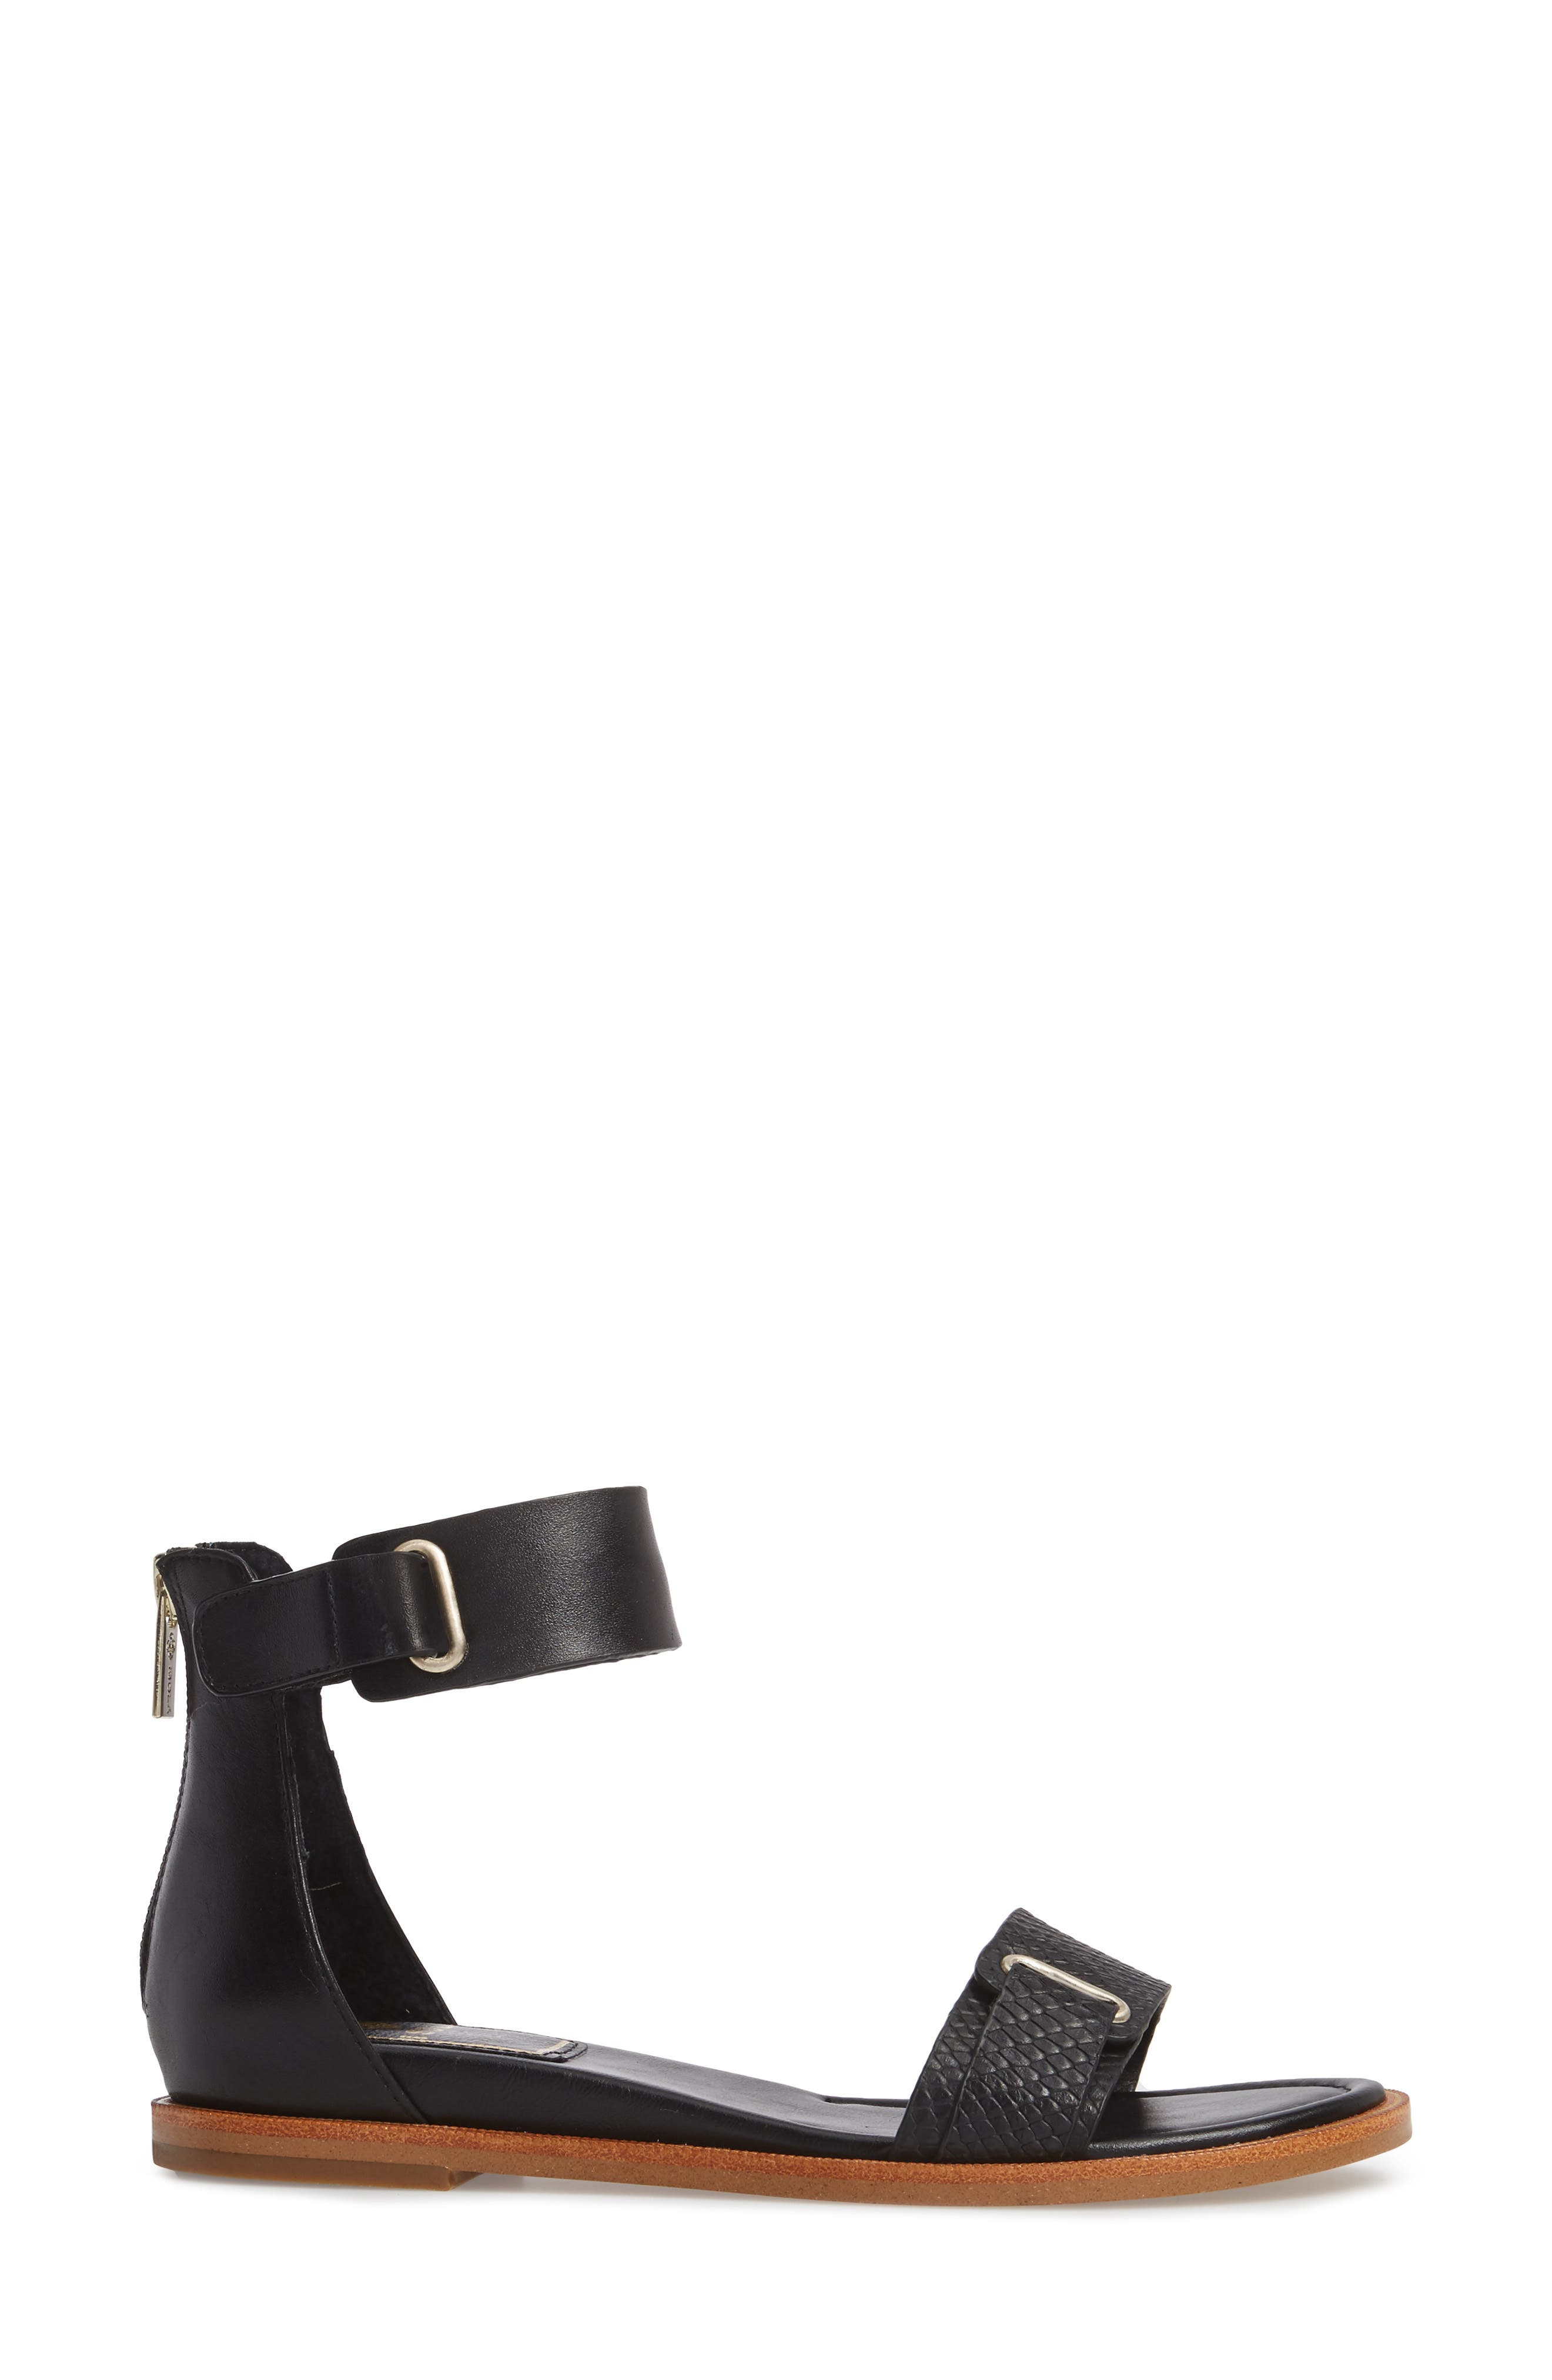 ISOLÁ, Savina Ankle Strap Sandal, Alternate thumbnail 3, color, BLACK LEATHER